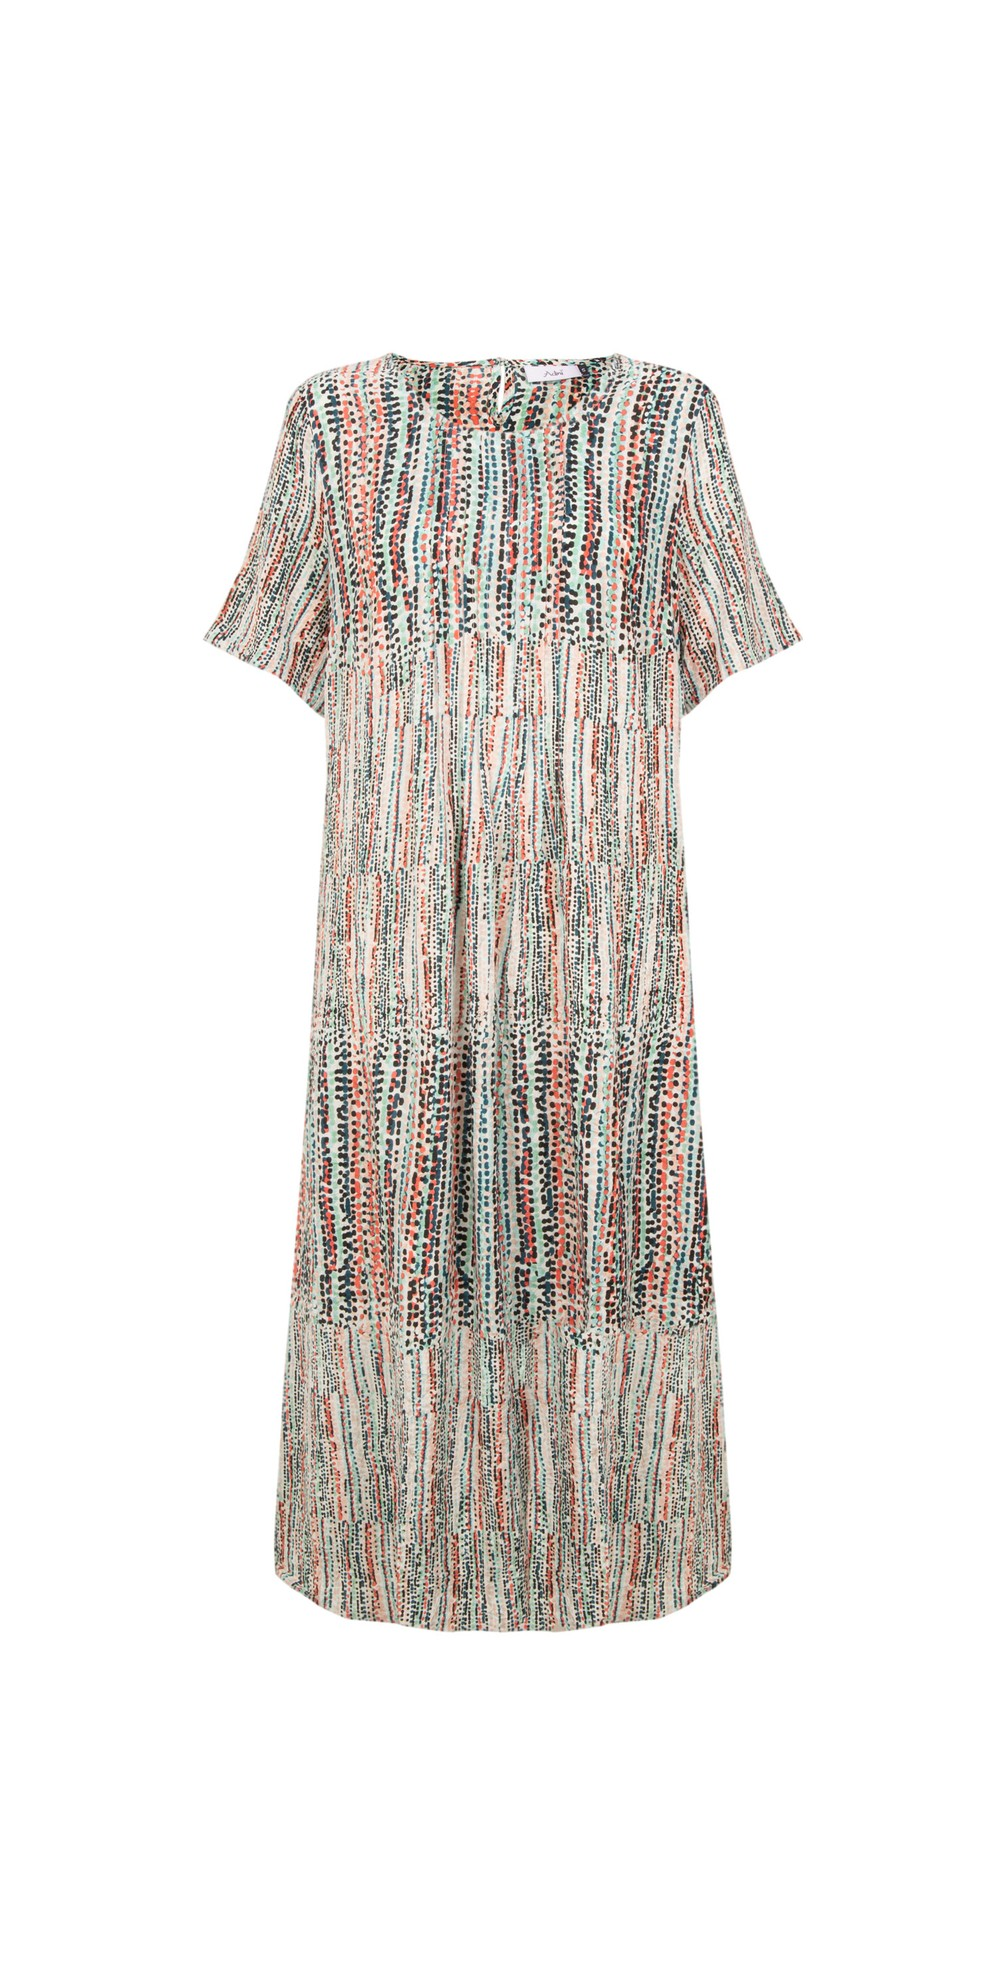 Cressida Horizon Print Dress main image